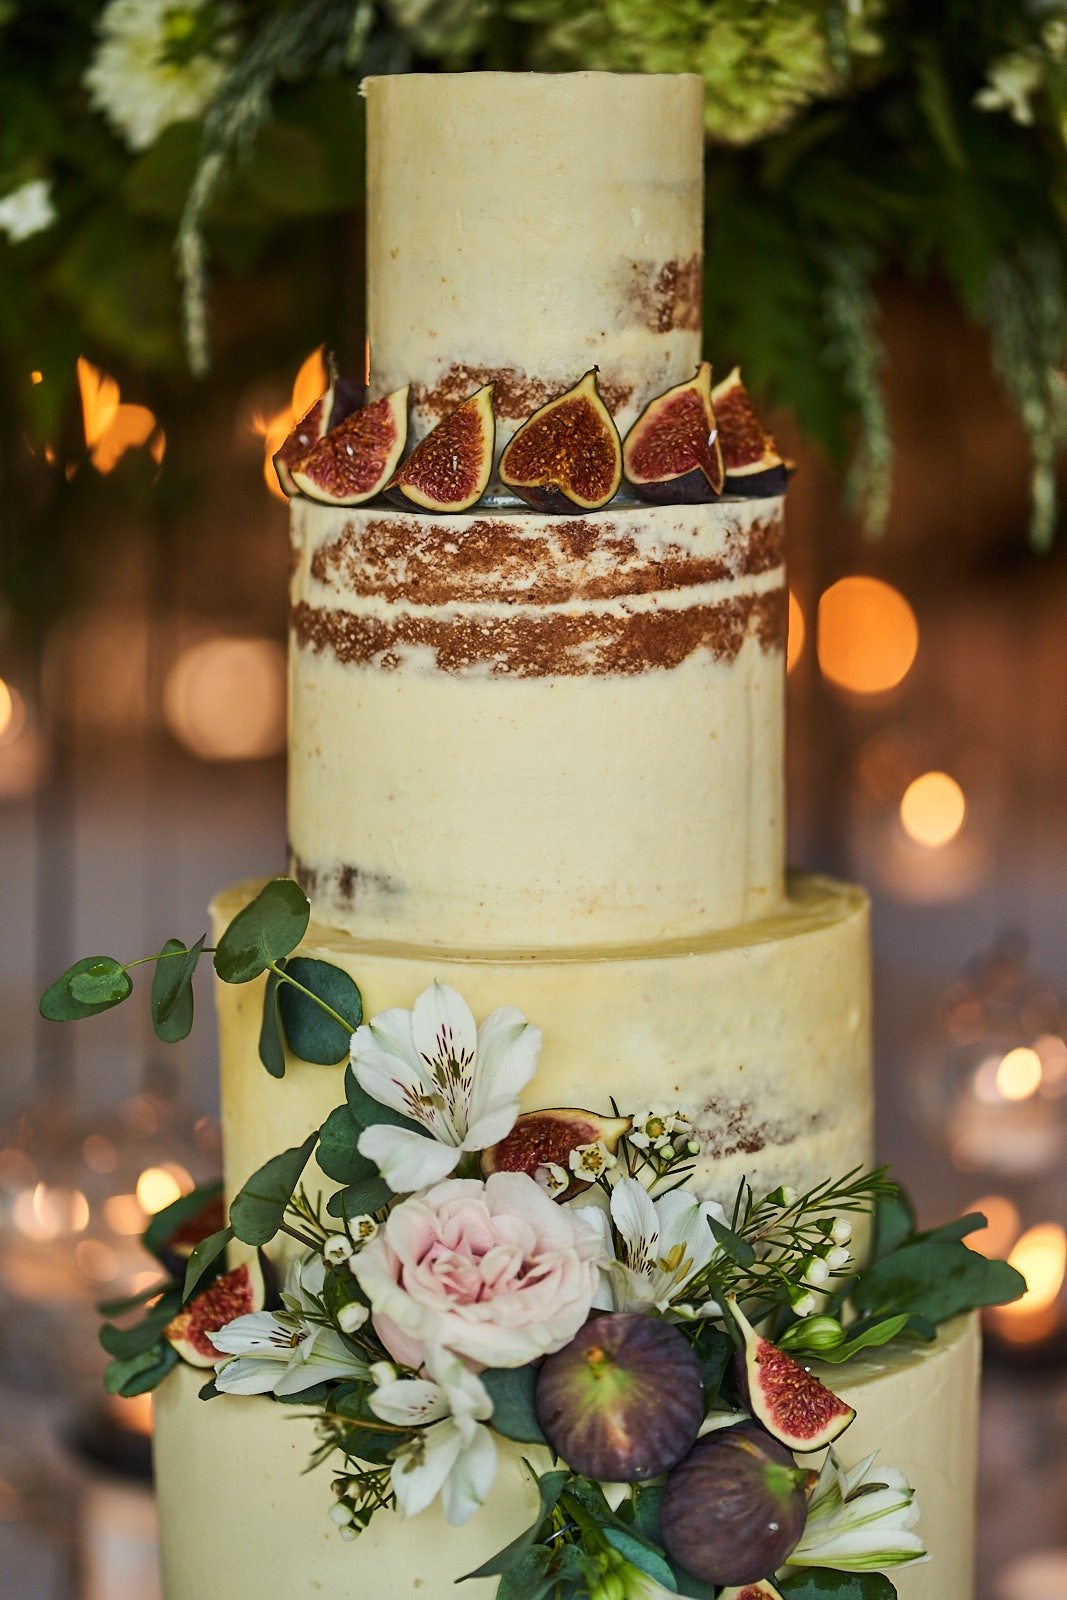 Iscoyd-cake-close-up